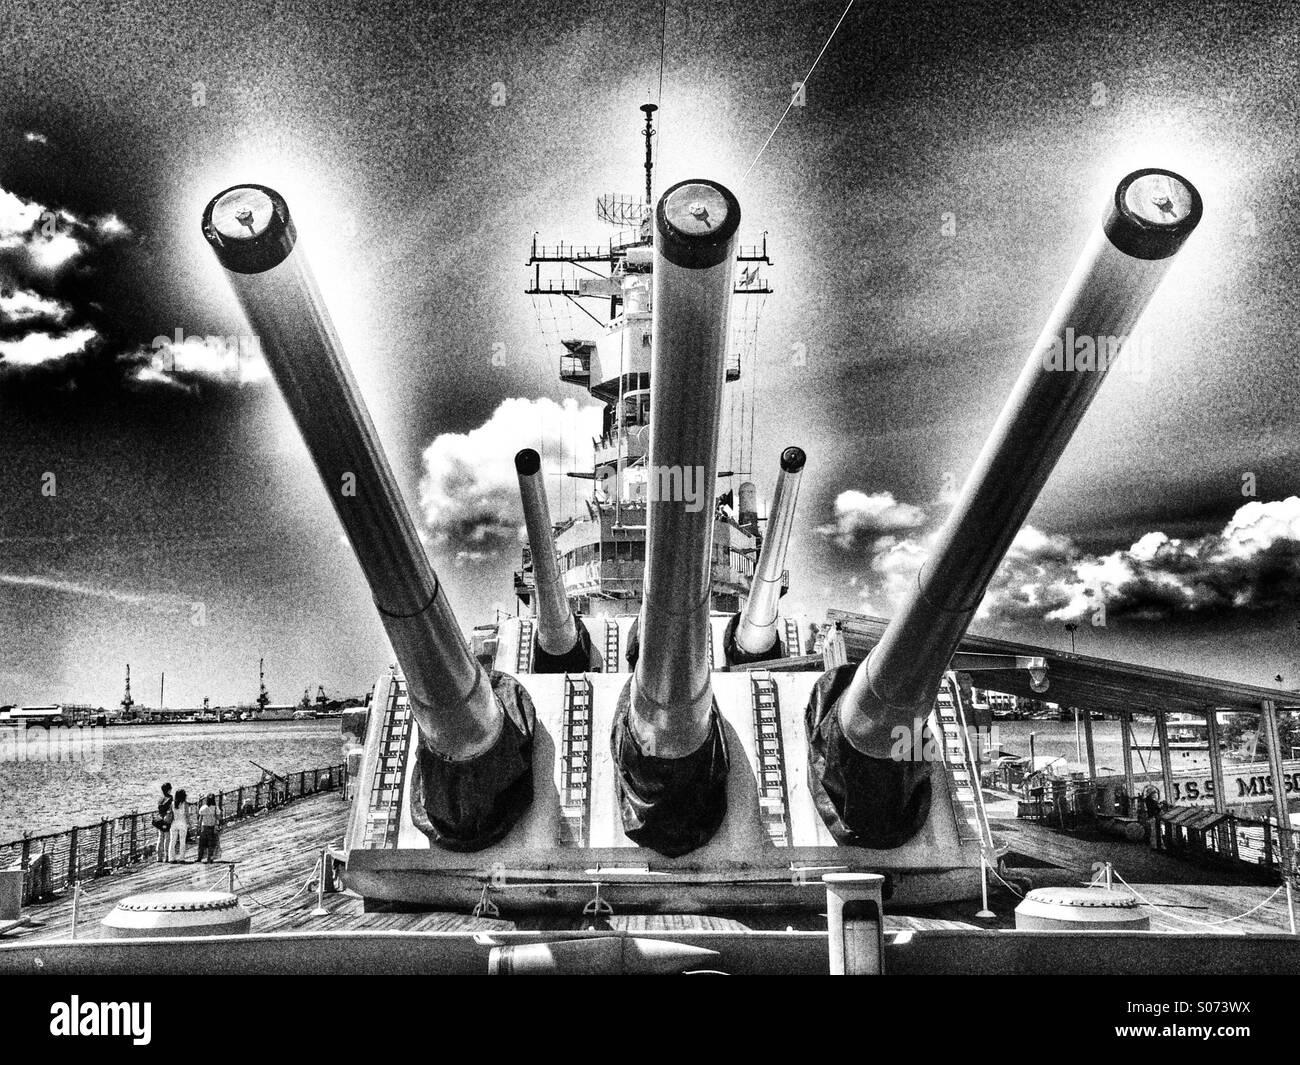 16_inch_guns_on_USS_Missouri-S073WX.jpg